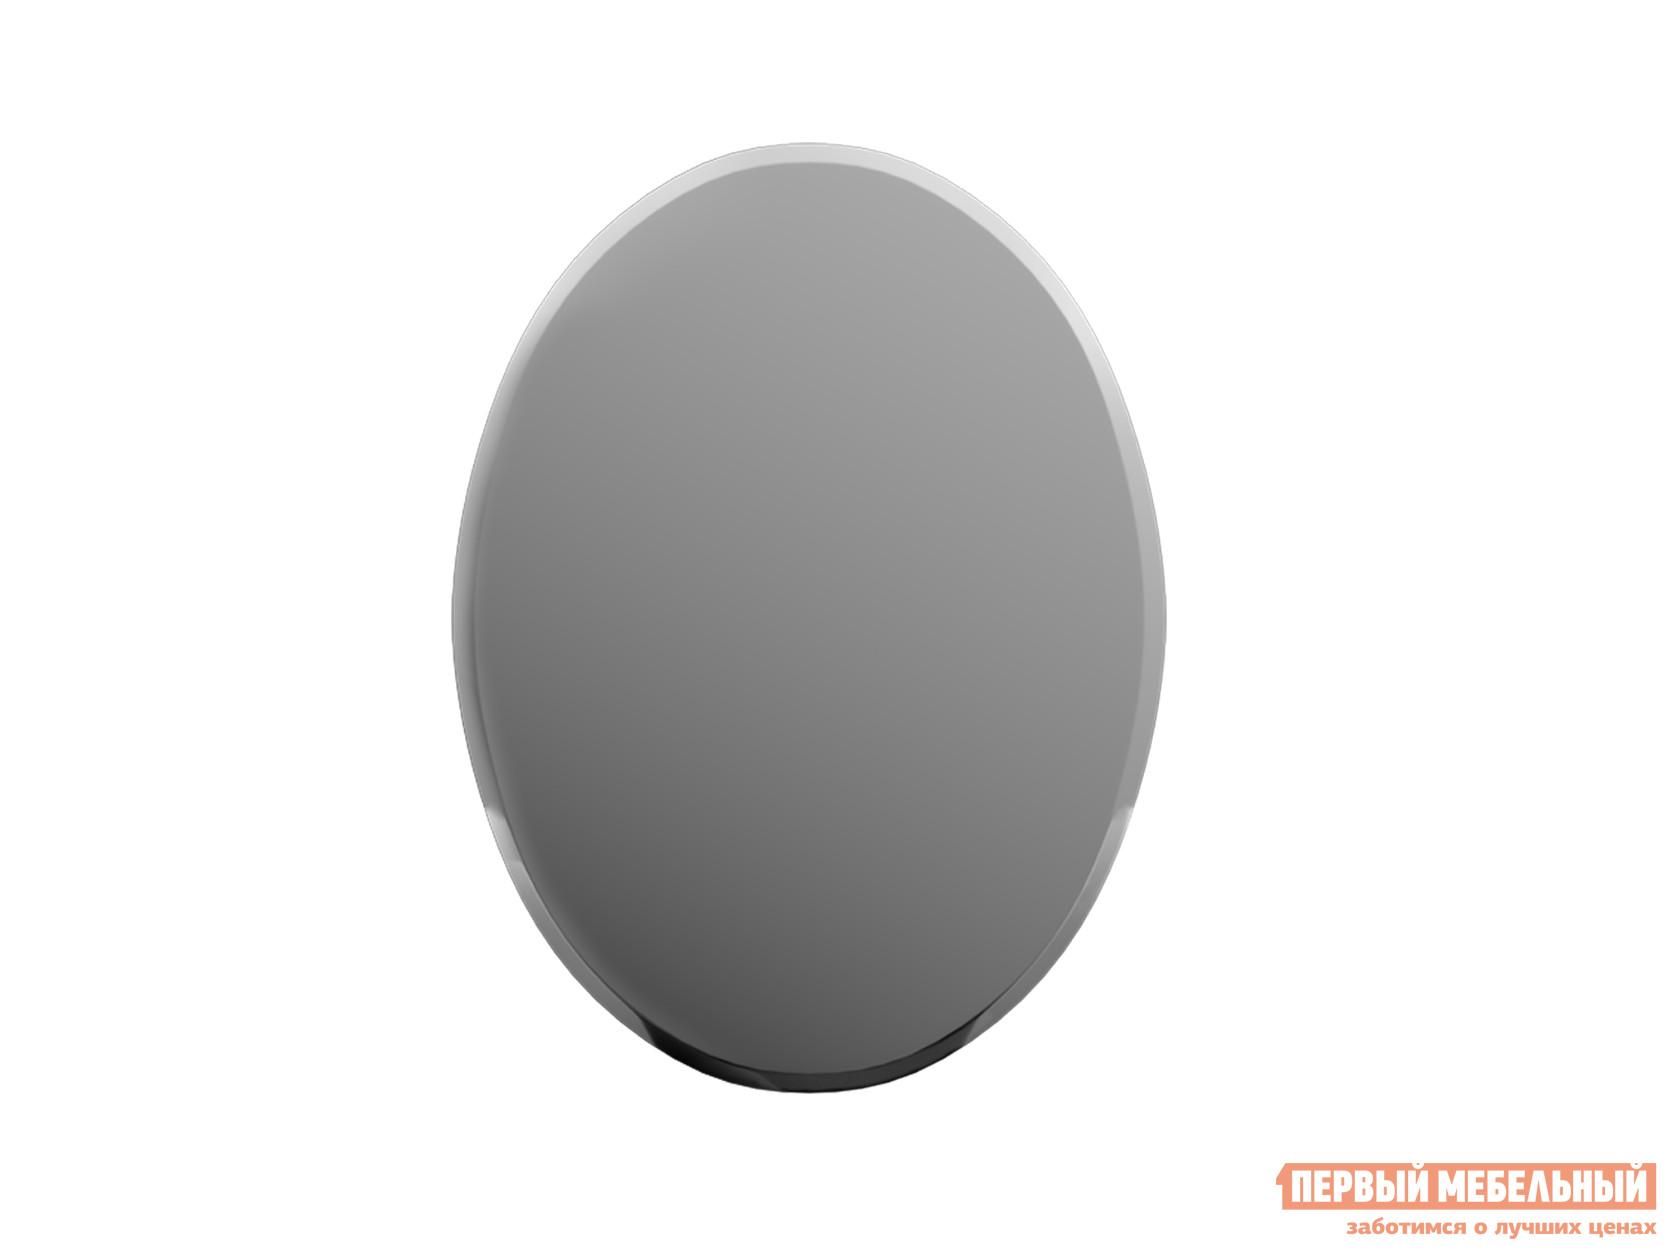 Настенное зеркало Мебелик Зеркало настенное Сельетта-3 зеркало настенное home philosophy male collection 70379